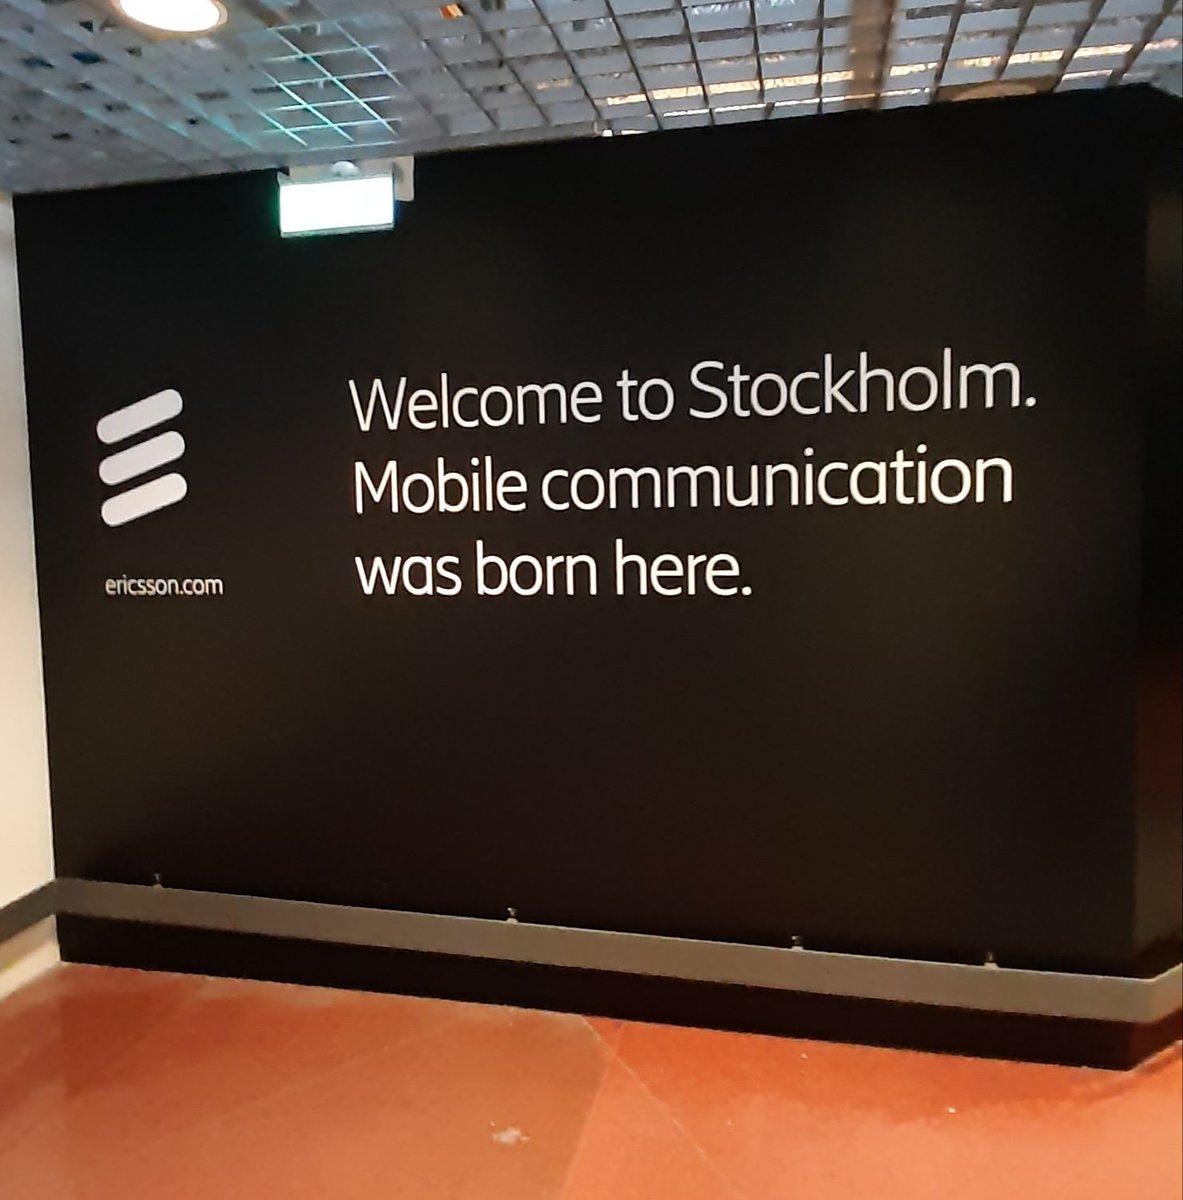 Welcome to @Stockholmsstad  Mobile communication was born here by @ericsson. #Ericssonawesome #EricssonAmbassador #QuestForEasy  #TeamEricsson @swedense @Arlanda #cloud #5G #IoT #AIpic.twitter.com/VvqAW4uoFf